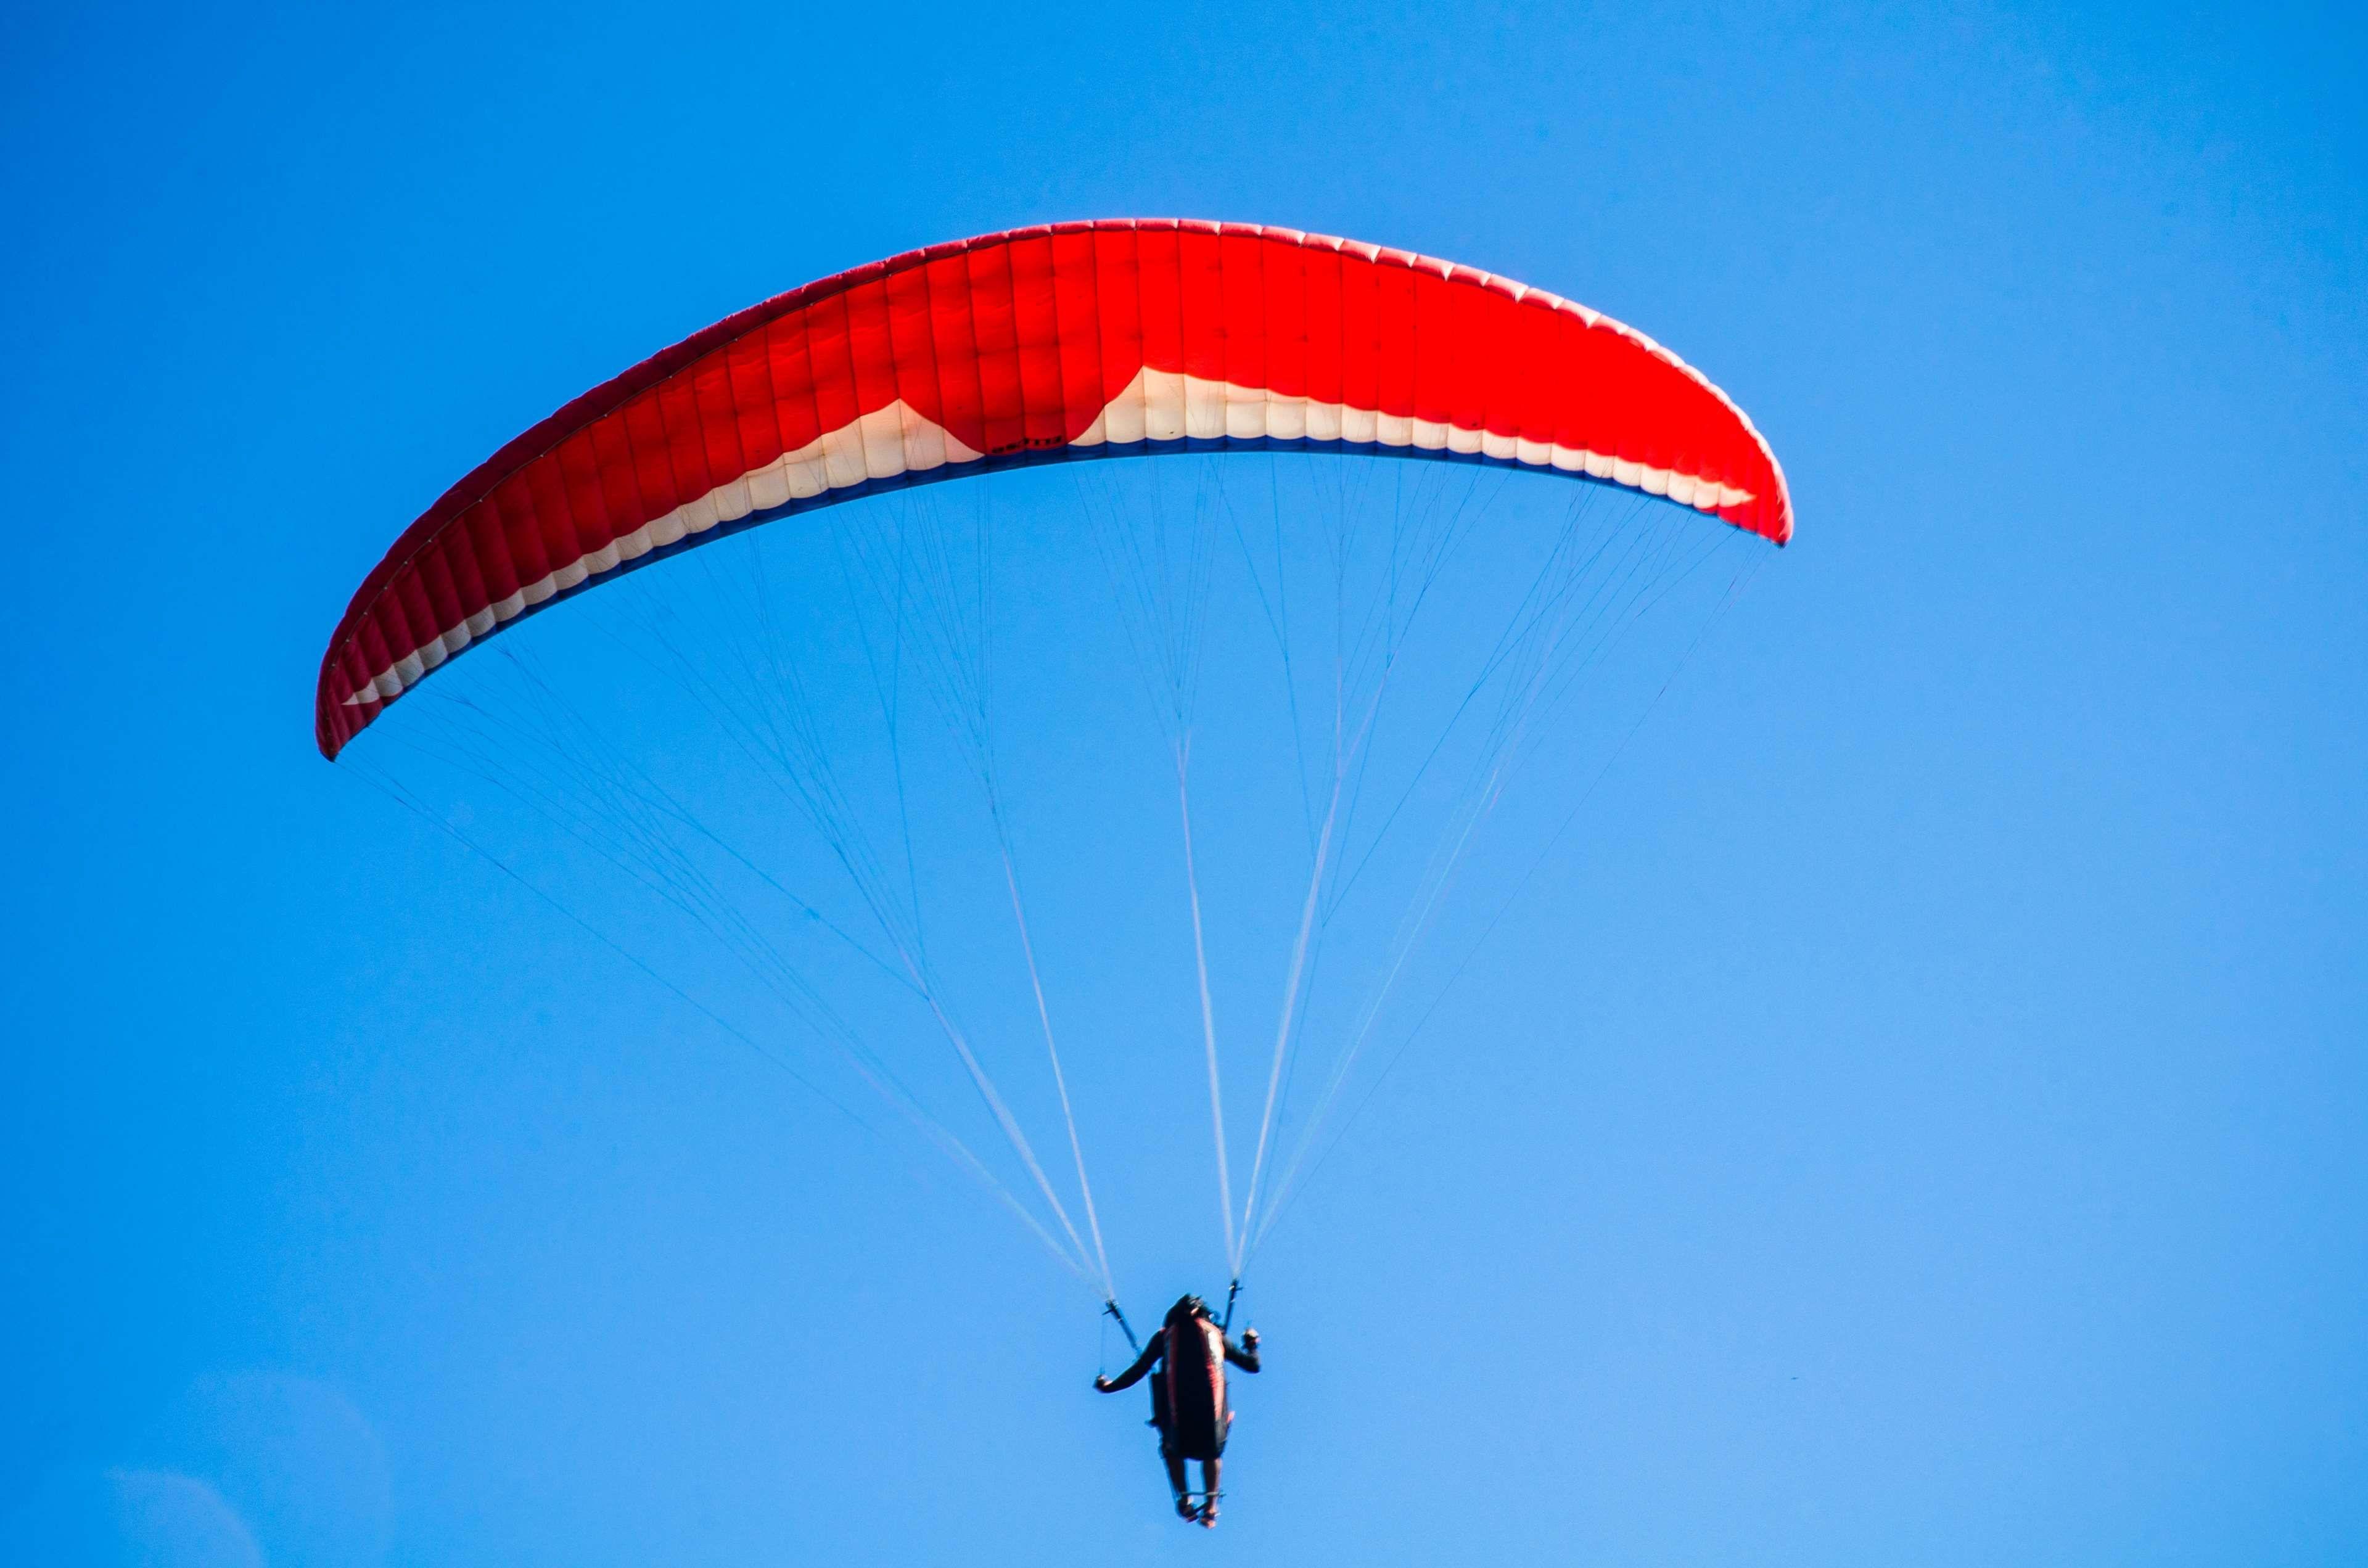 #action #adventure #fly #fun #man #parachute #paragliding #person #sport